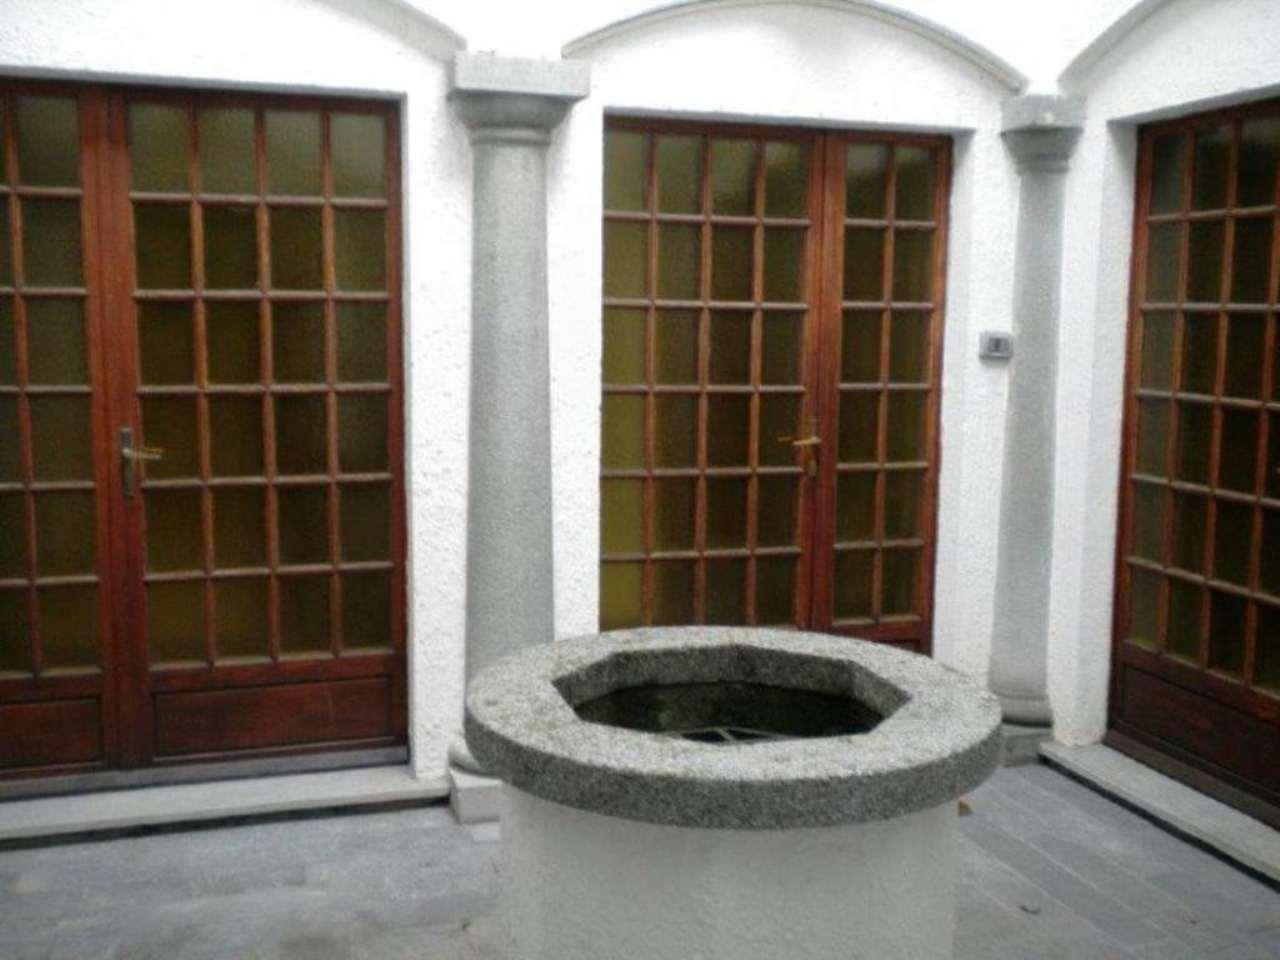 Villa in Vendita a Courmayeur: 5 locali, 220 mq - Foto 7